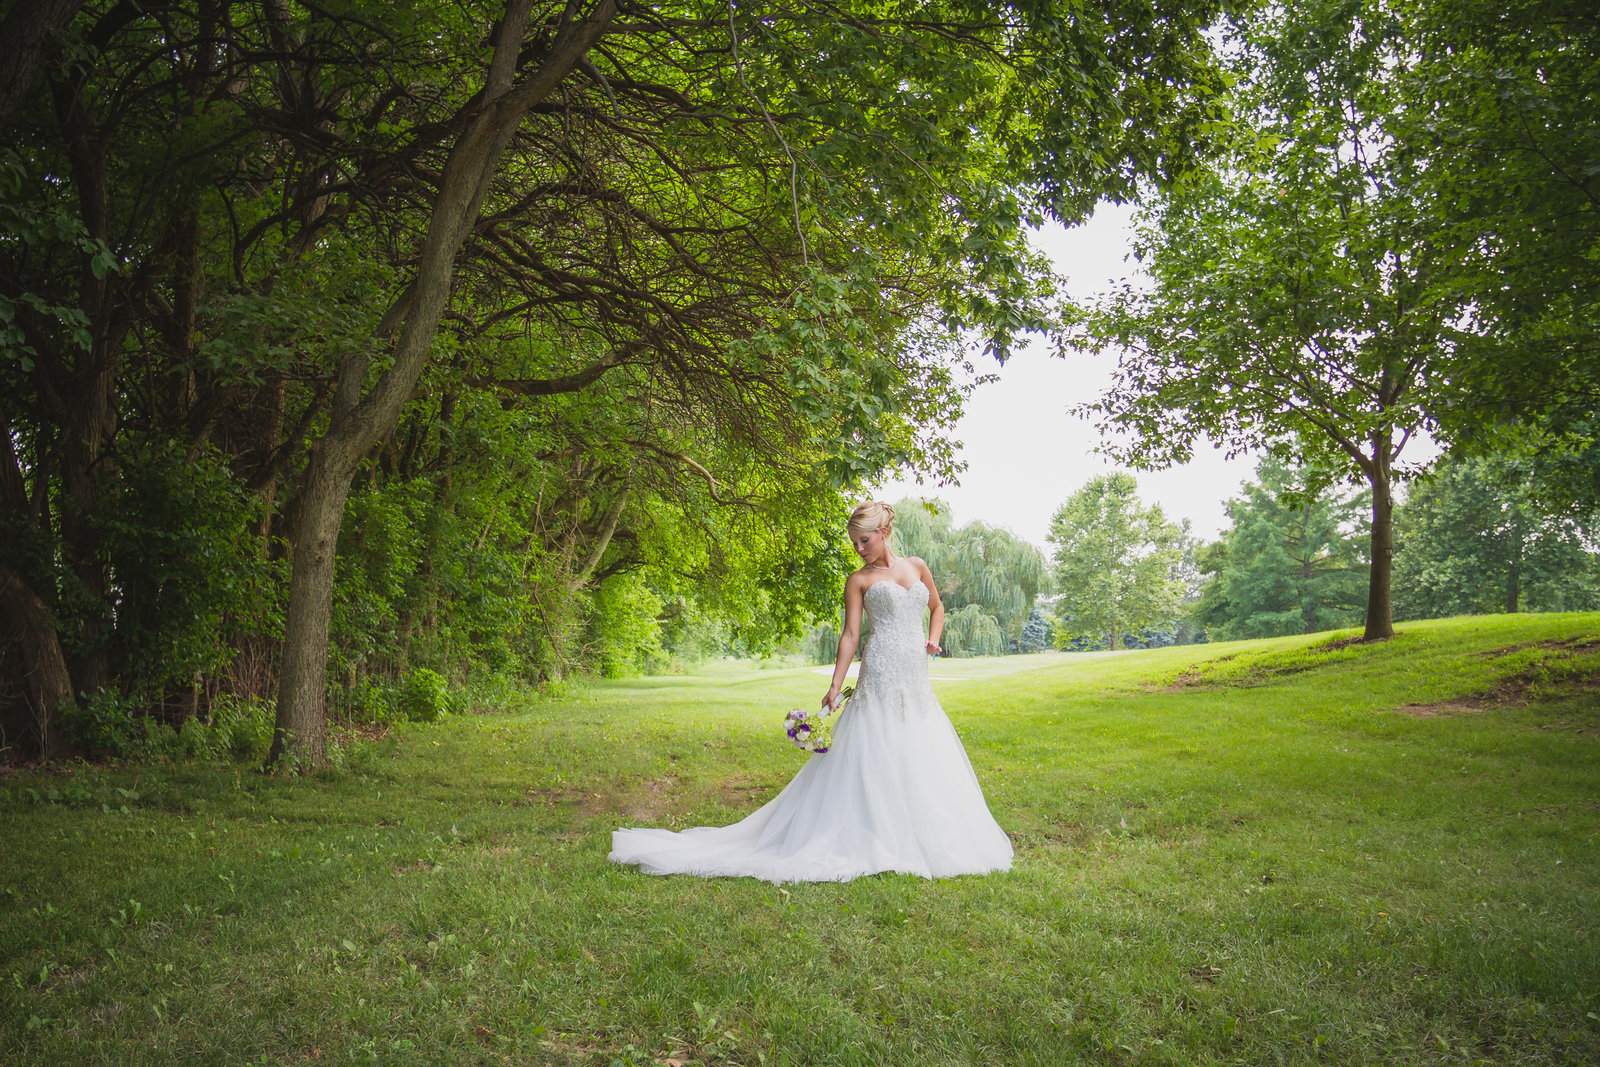 Beautiful bride outdoor bridal photo  in Overland Park, Kansas